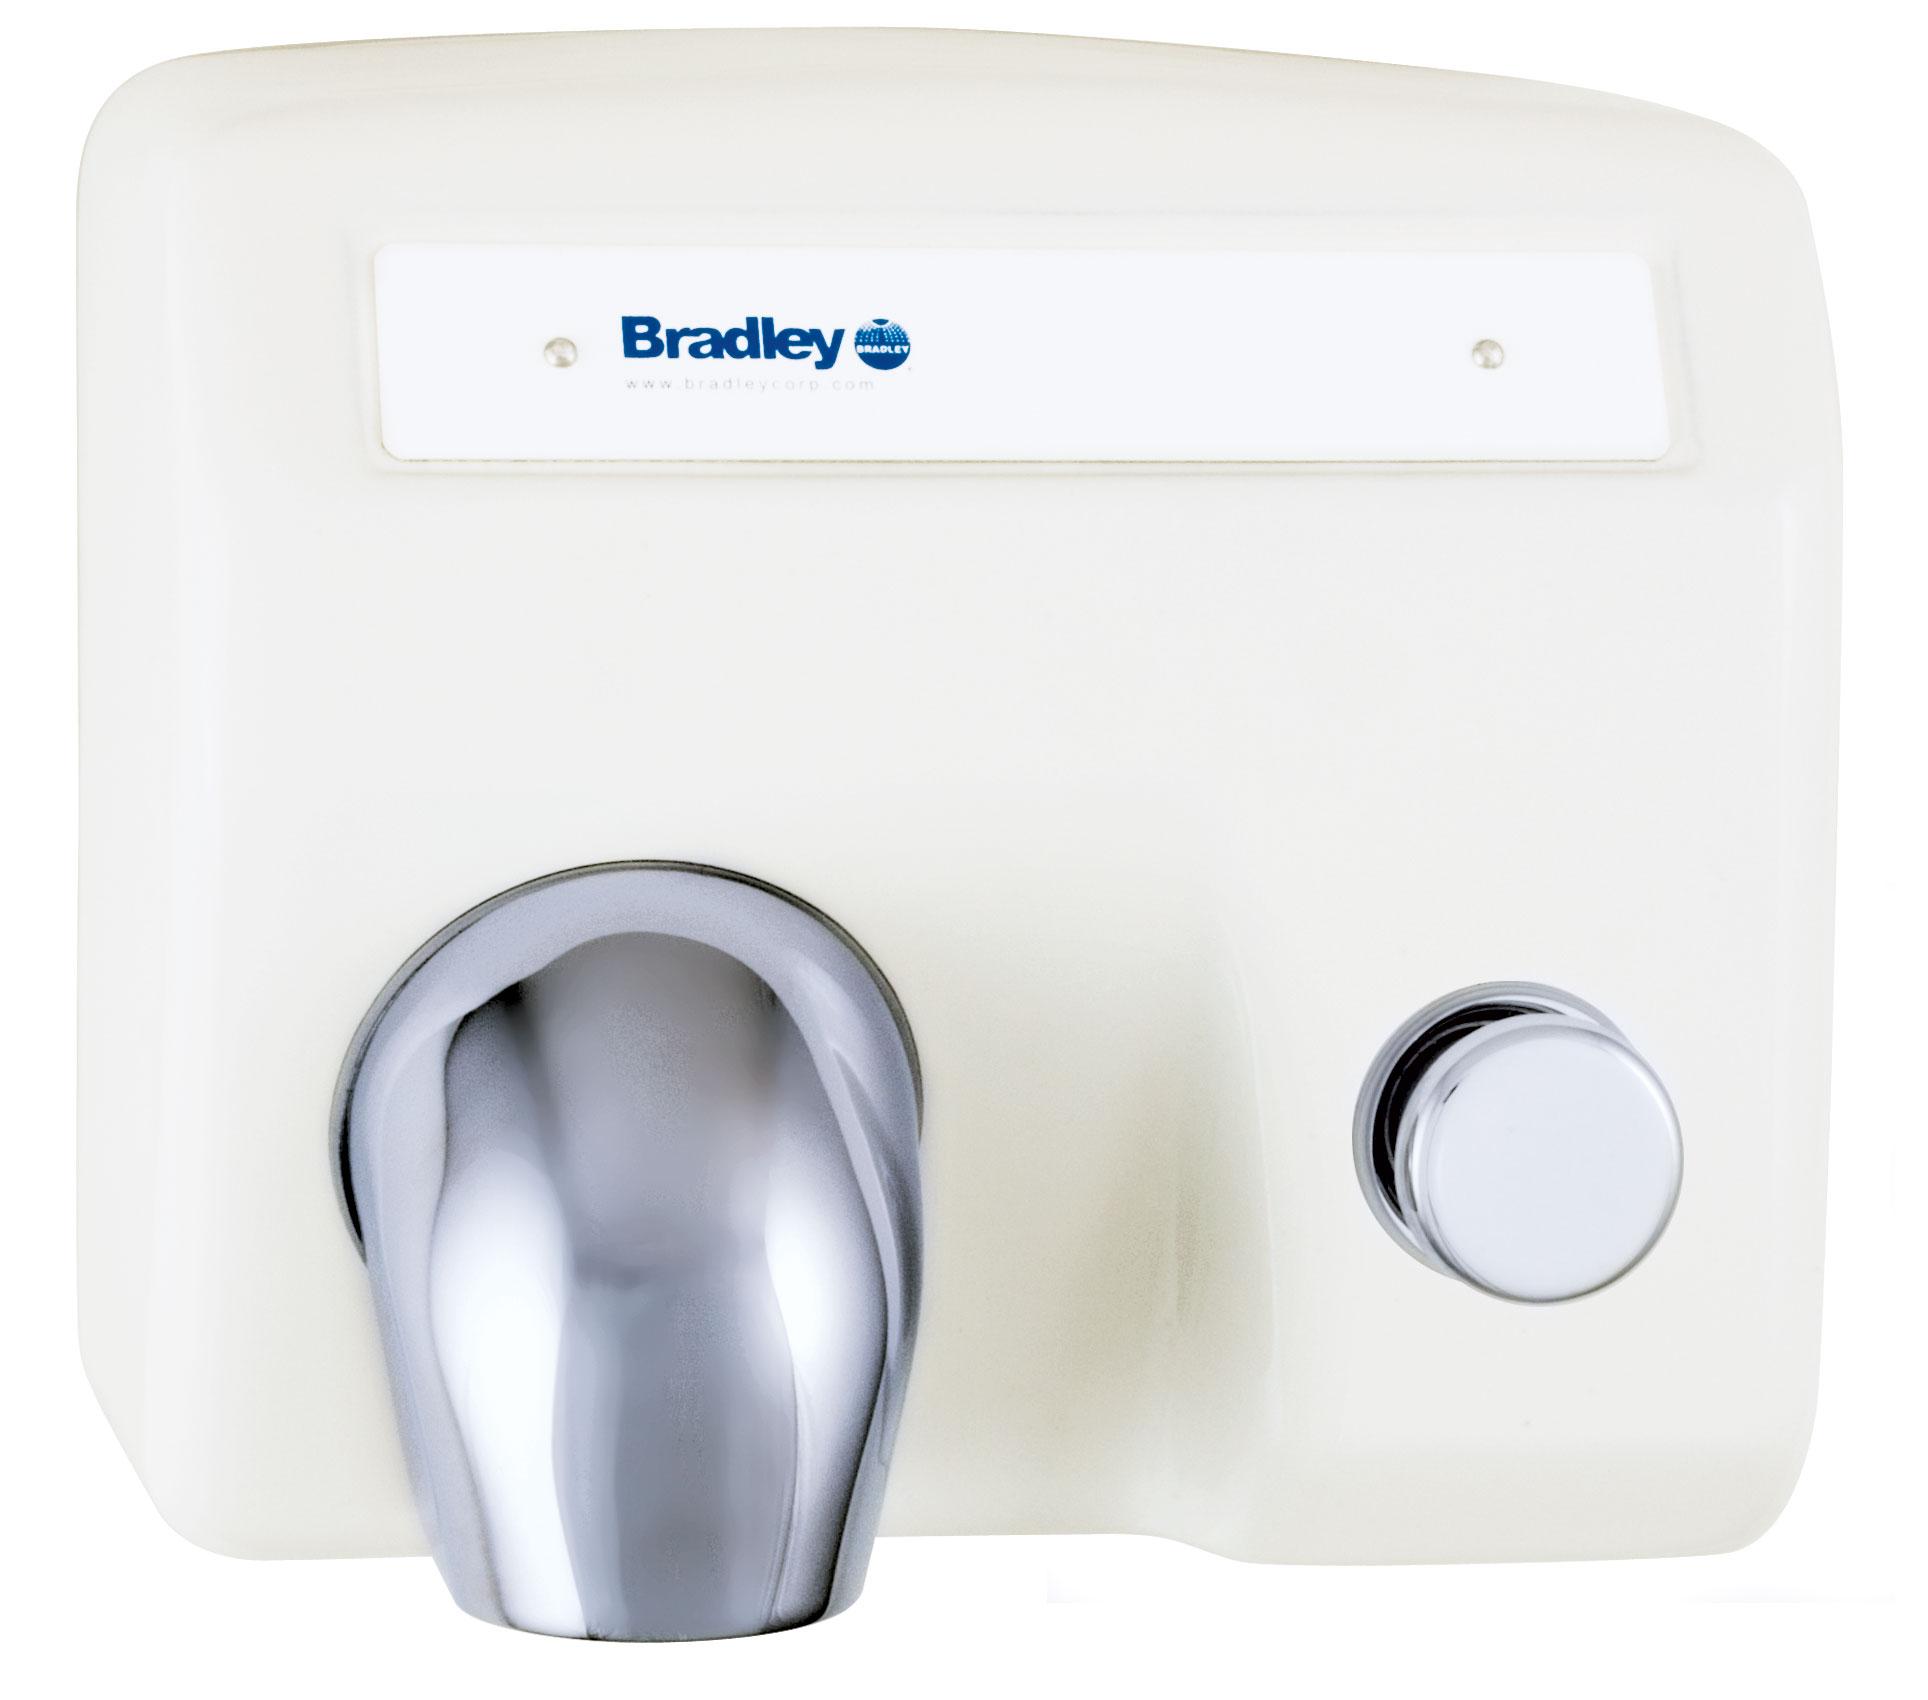 aerix hand dryer, push button-operated - bradley corporation